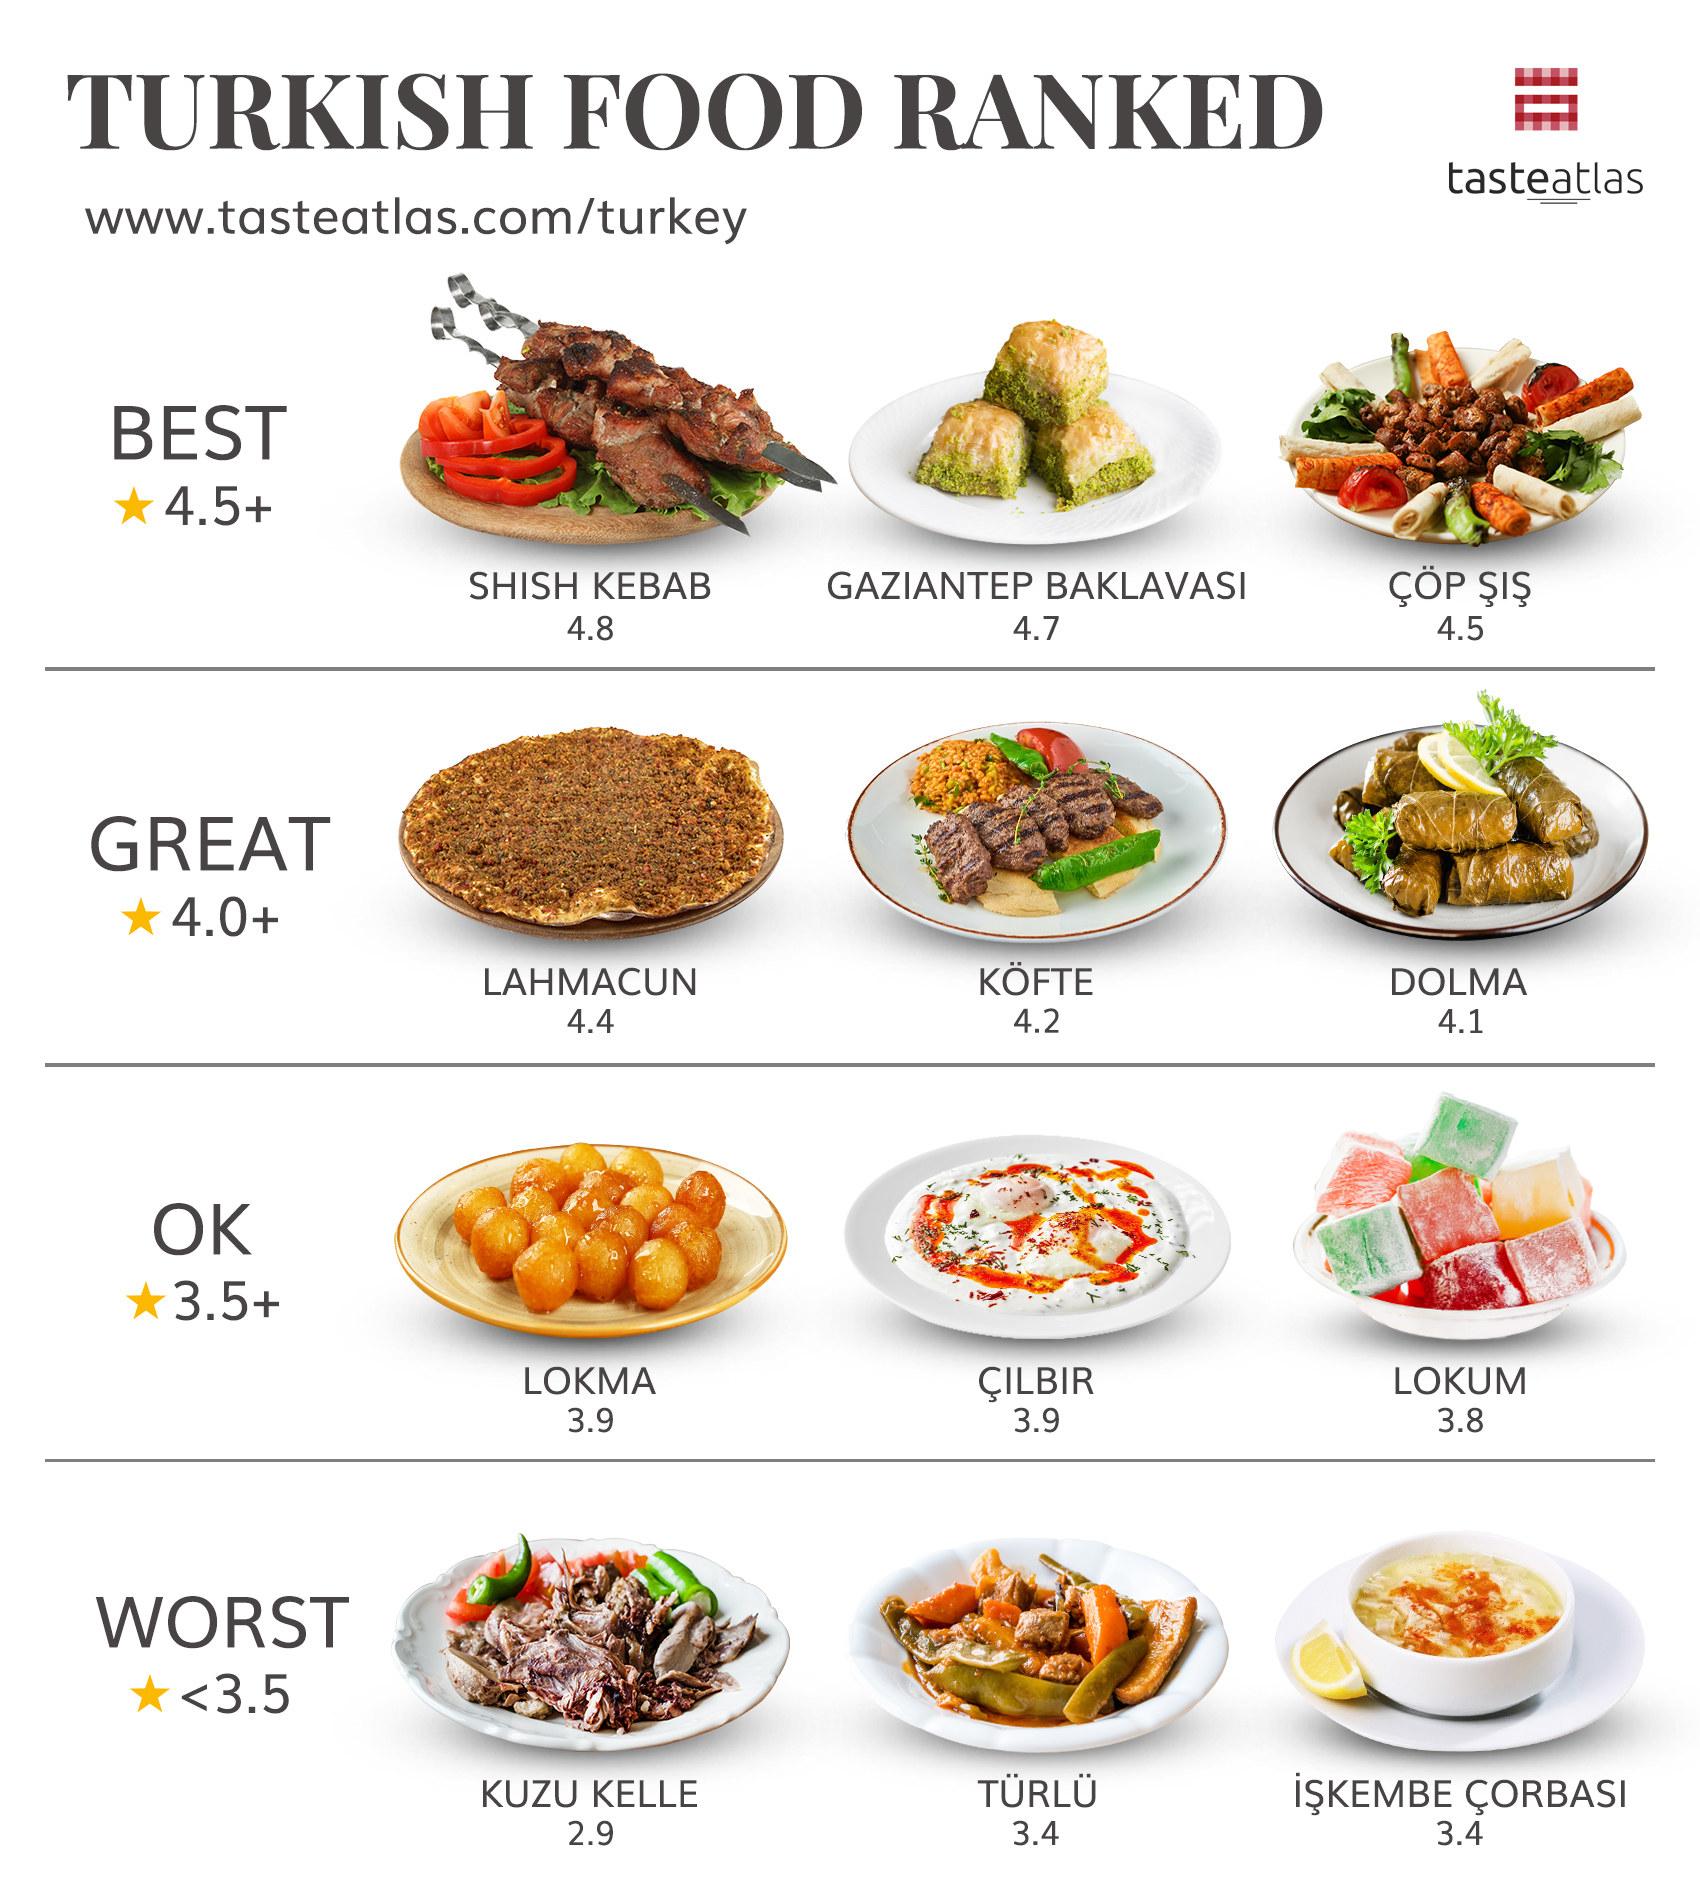 Graphic showing shish kebab ranked best